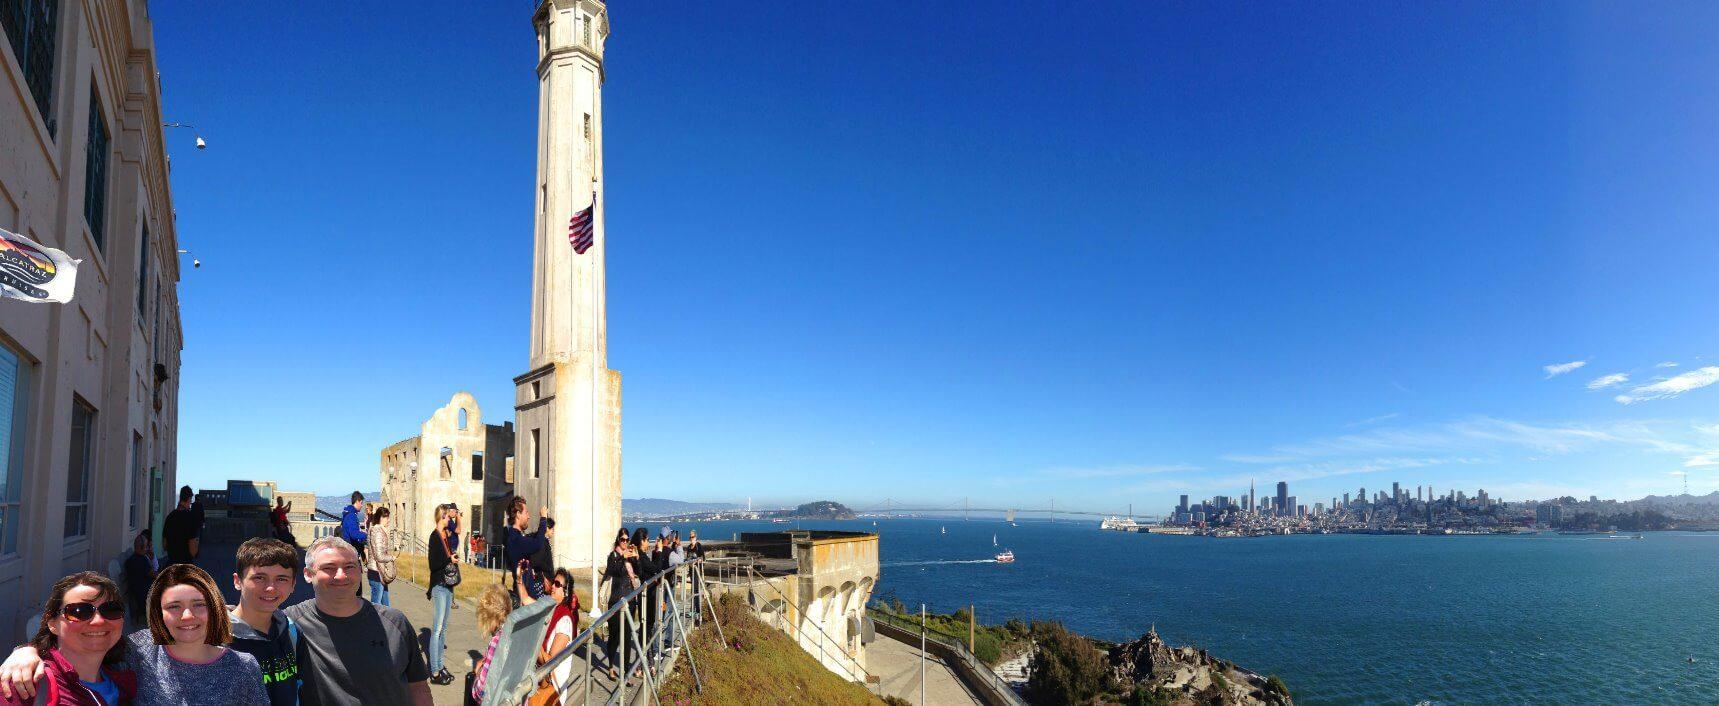 alcatraz-island-tickets-prison-tour-ferry-trip-from-san-francisco